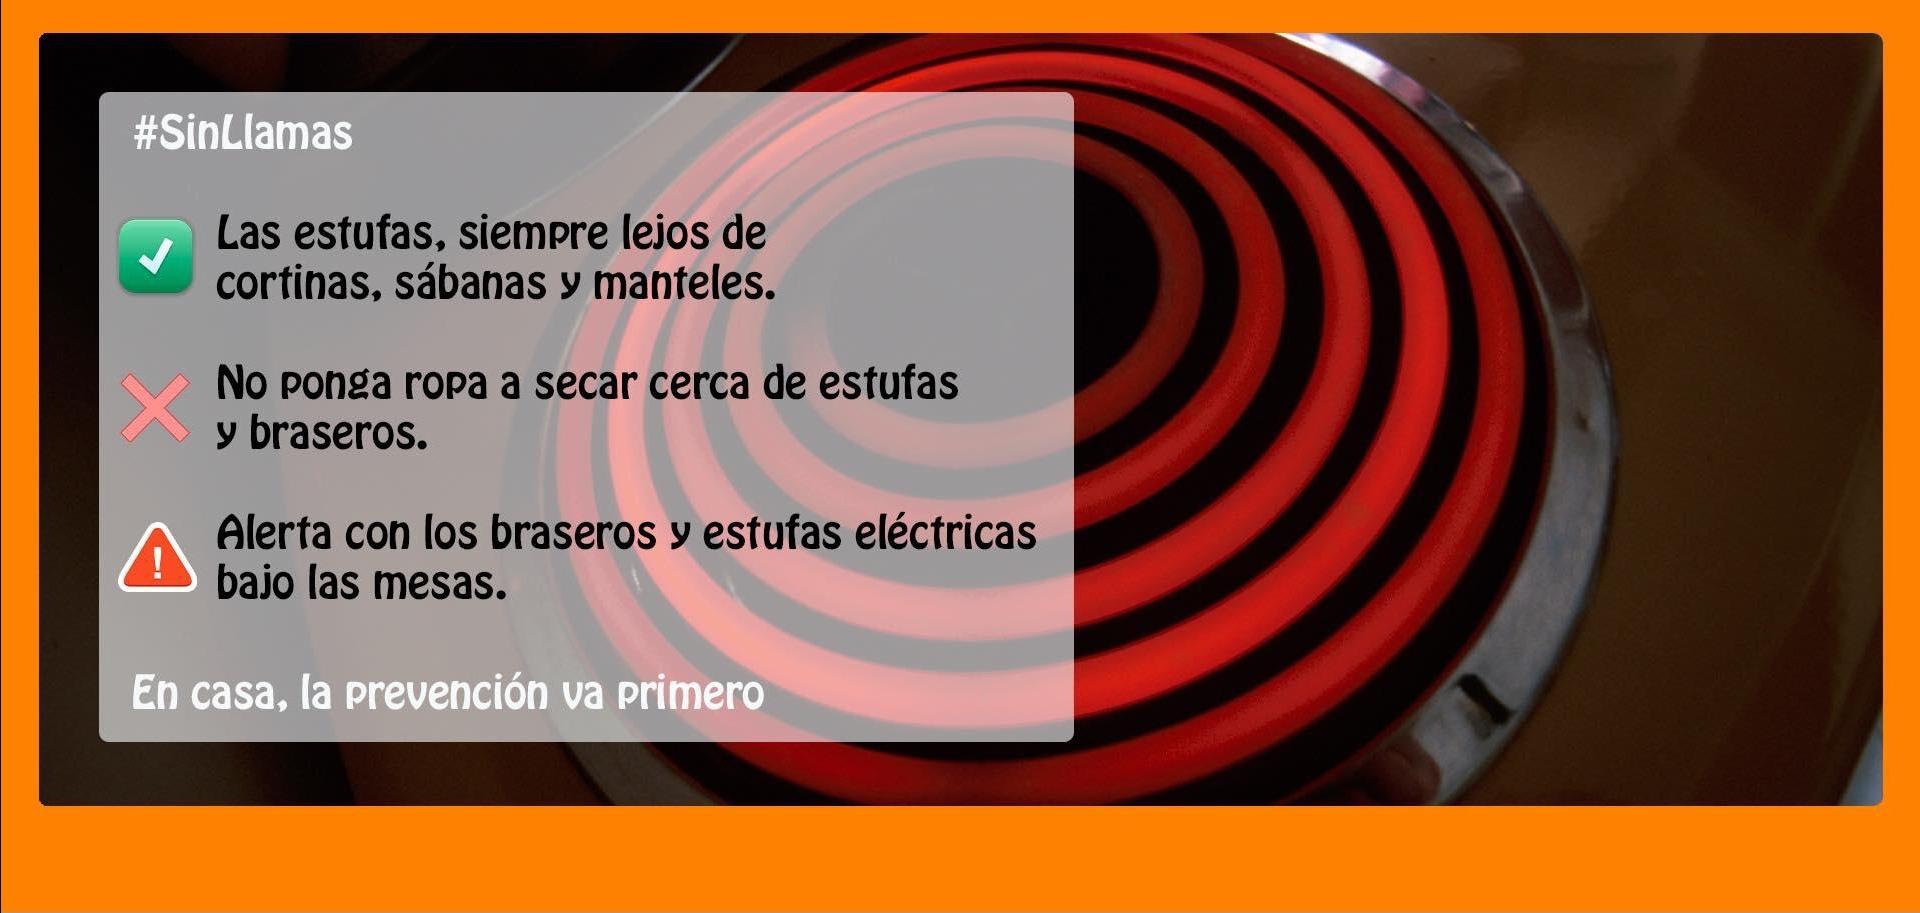 https://www.palmadelrio.es/sites/default/files/estufas.jpg